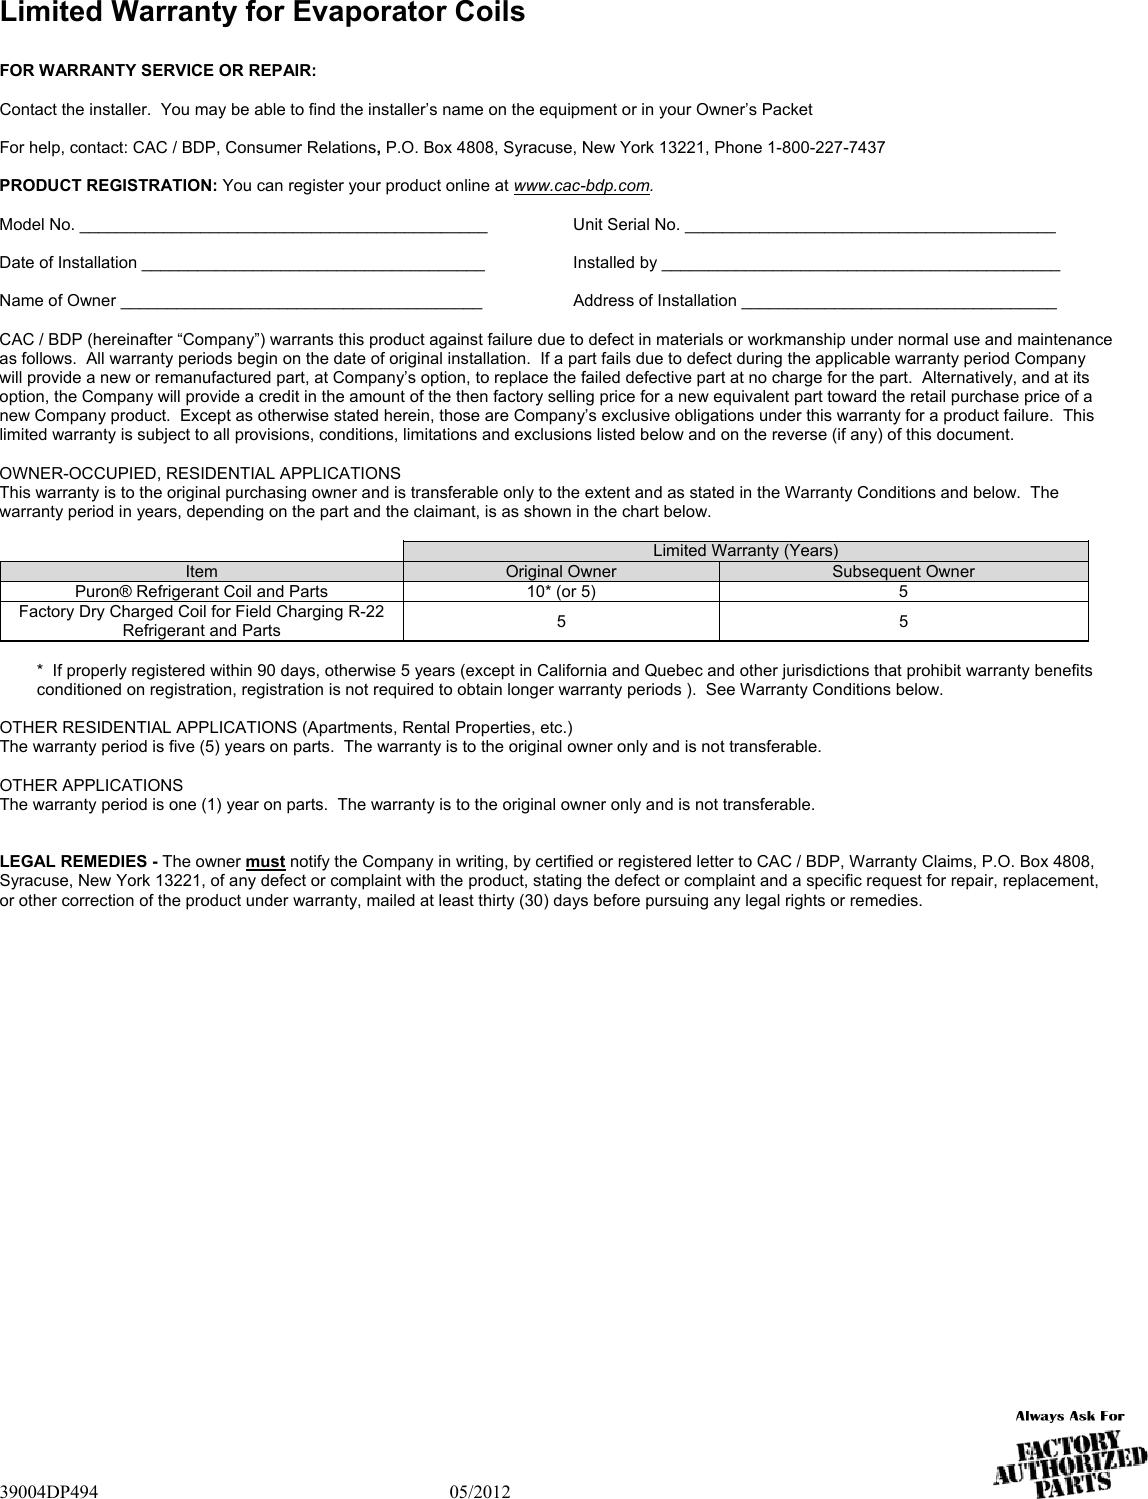 Carrier Capvu Warranty 39004DP494